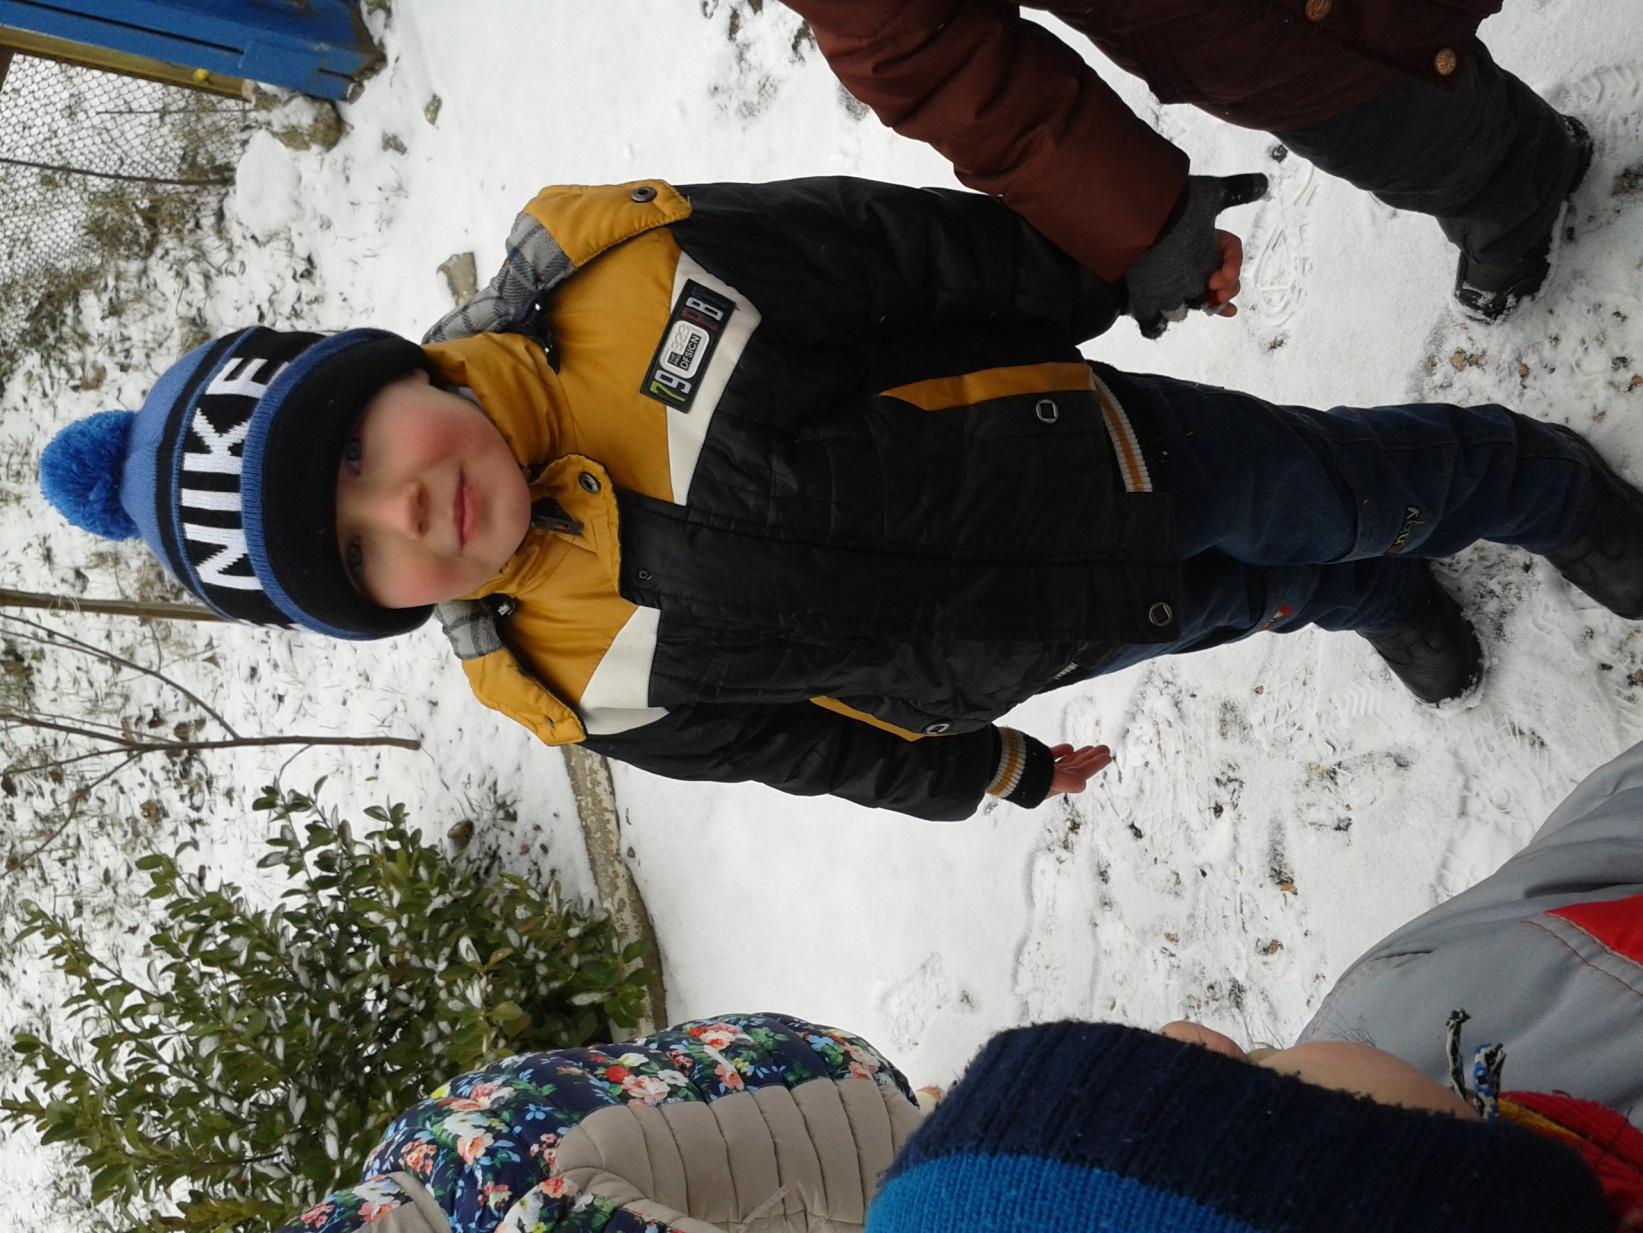 D:\детский сад\фото\2015-02-11 11.14.21.jpg